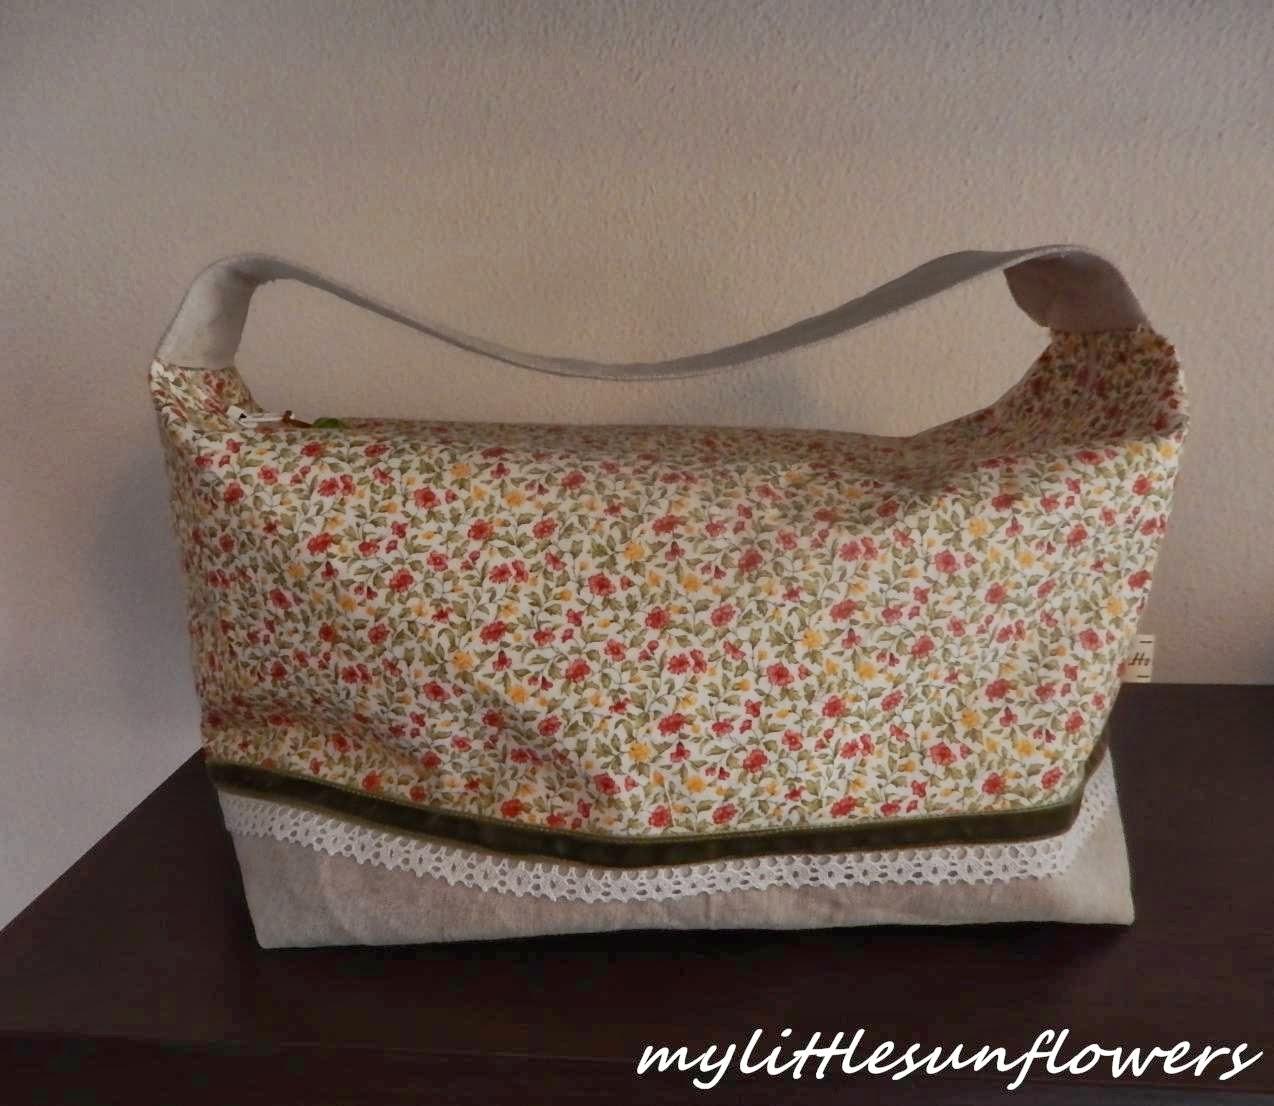 Super My little sunflowers: Tutorial e pattern borsa portatrucchi+  HW14